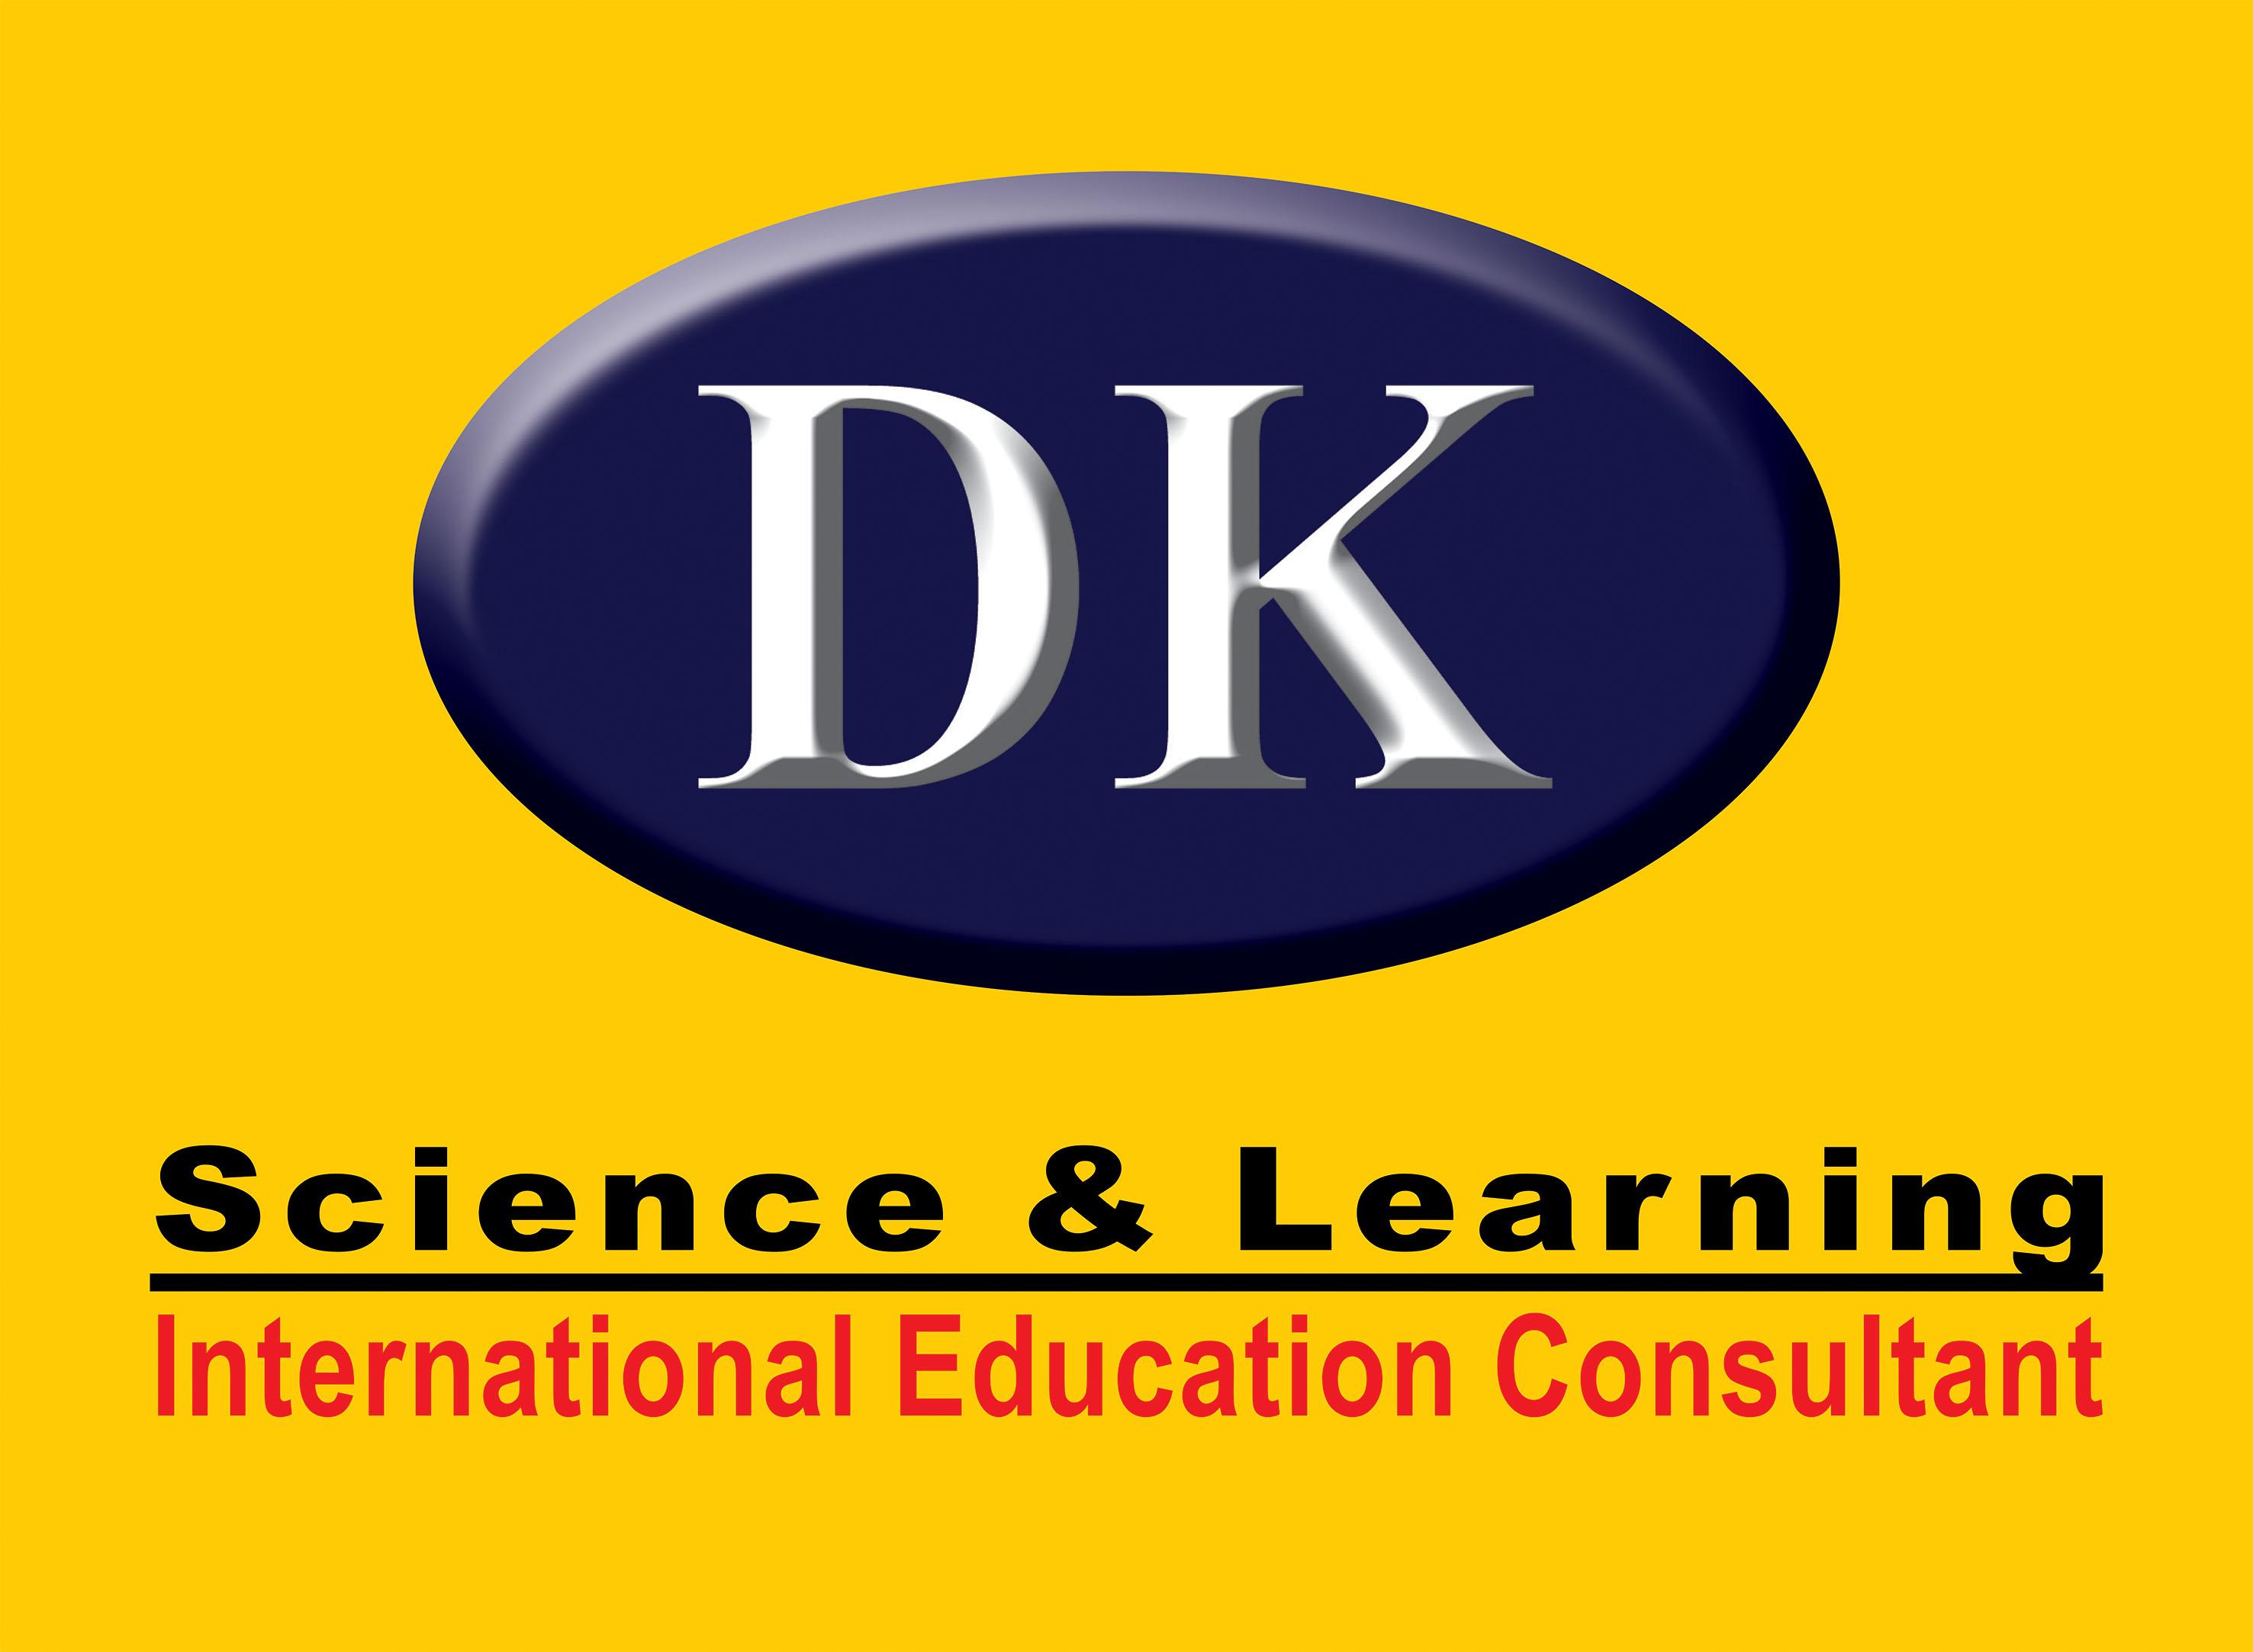 DK Education